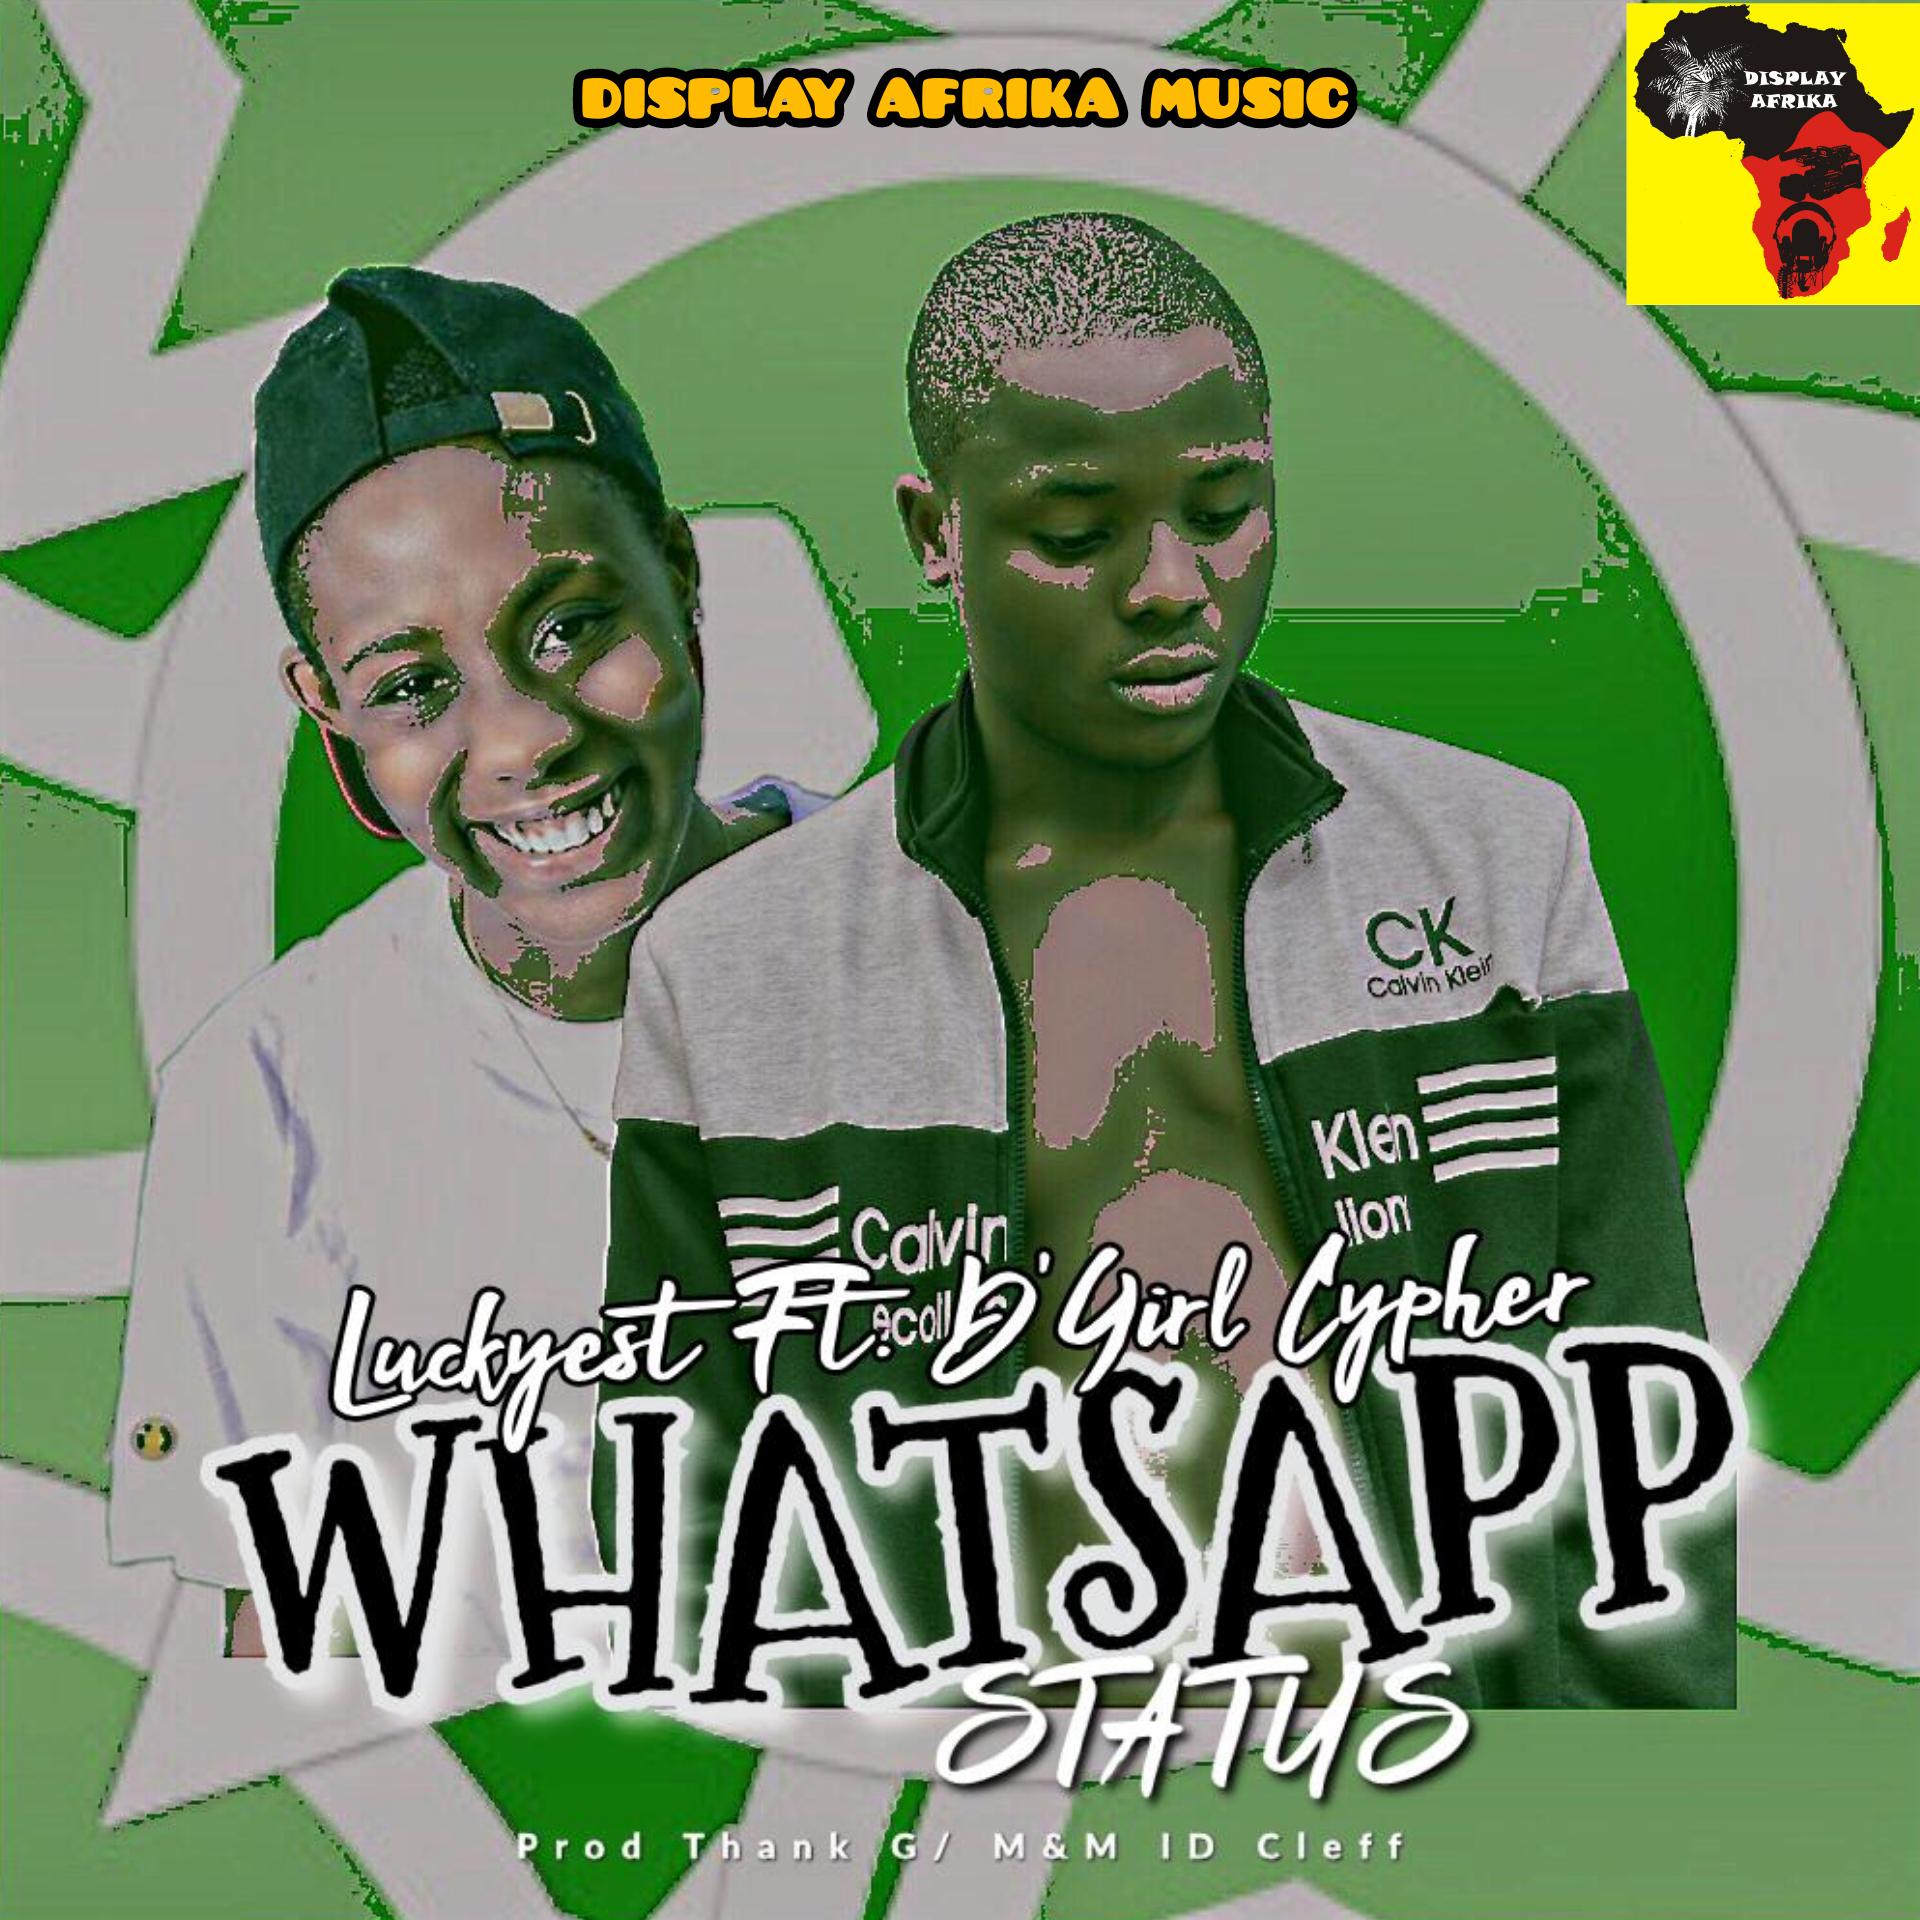 Music Luckyest Whatsapp Status Ft Dgirl Cypher